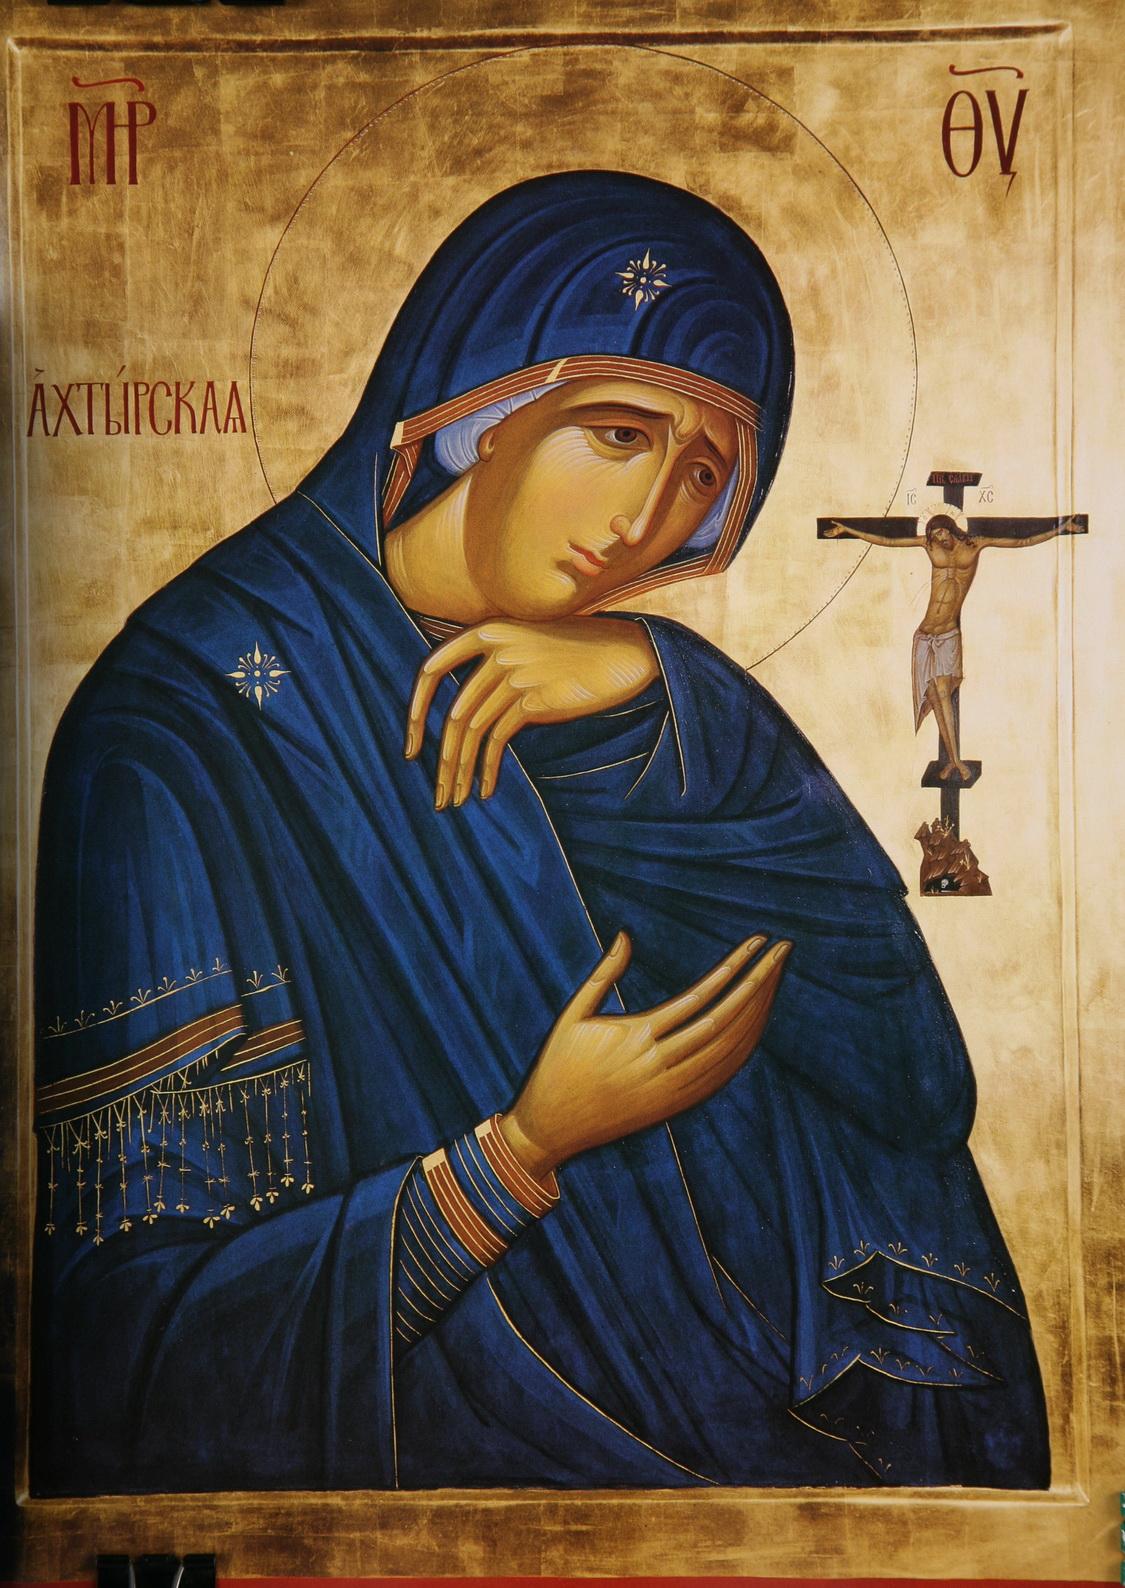 Скорбящая божья матерь 21 фотография